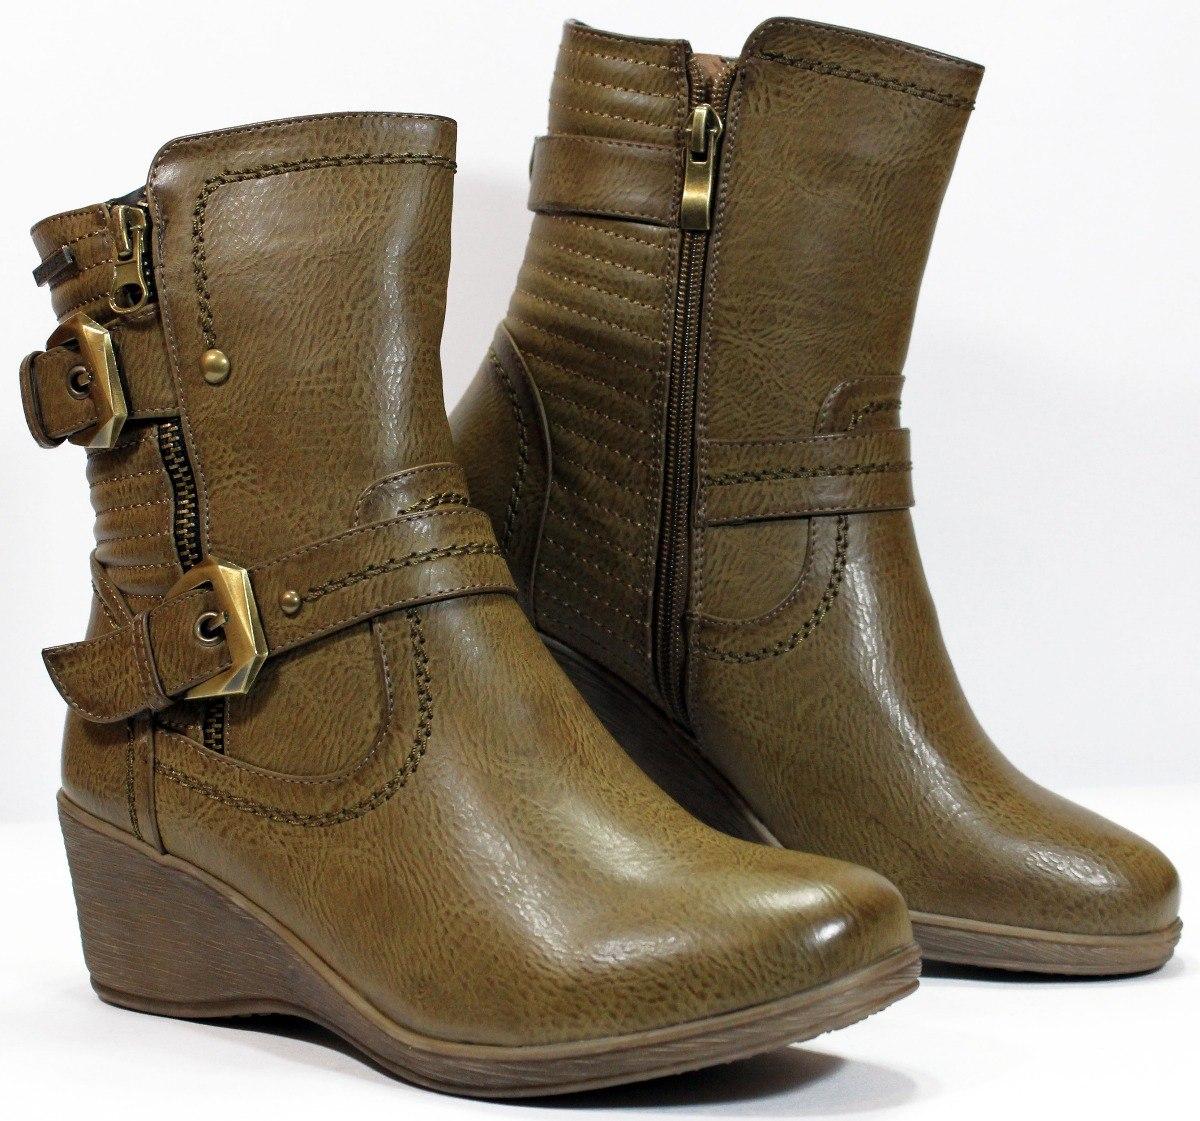 80e8aa5db botas chocolate media caña t  chino mujer 1192 calzados susy. Cargando zoom.